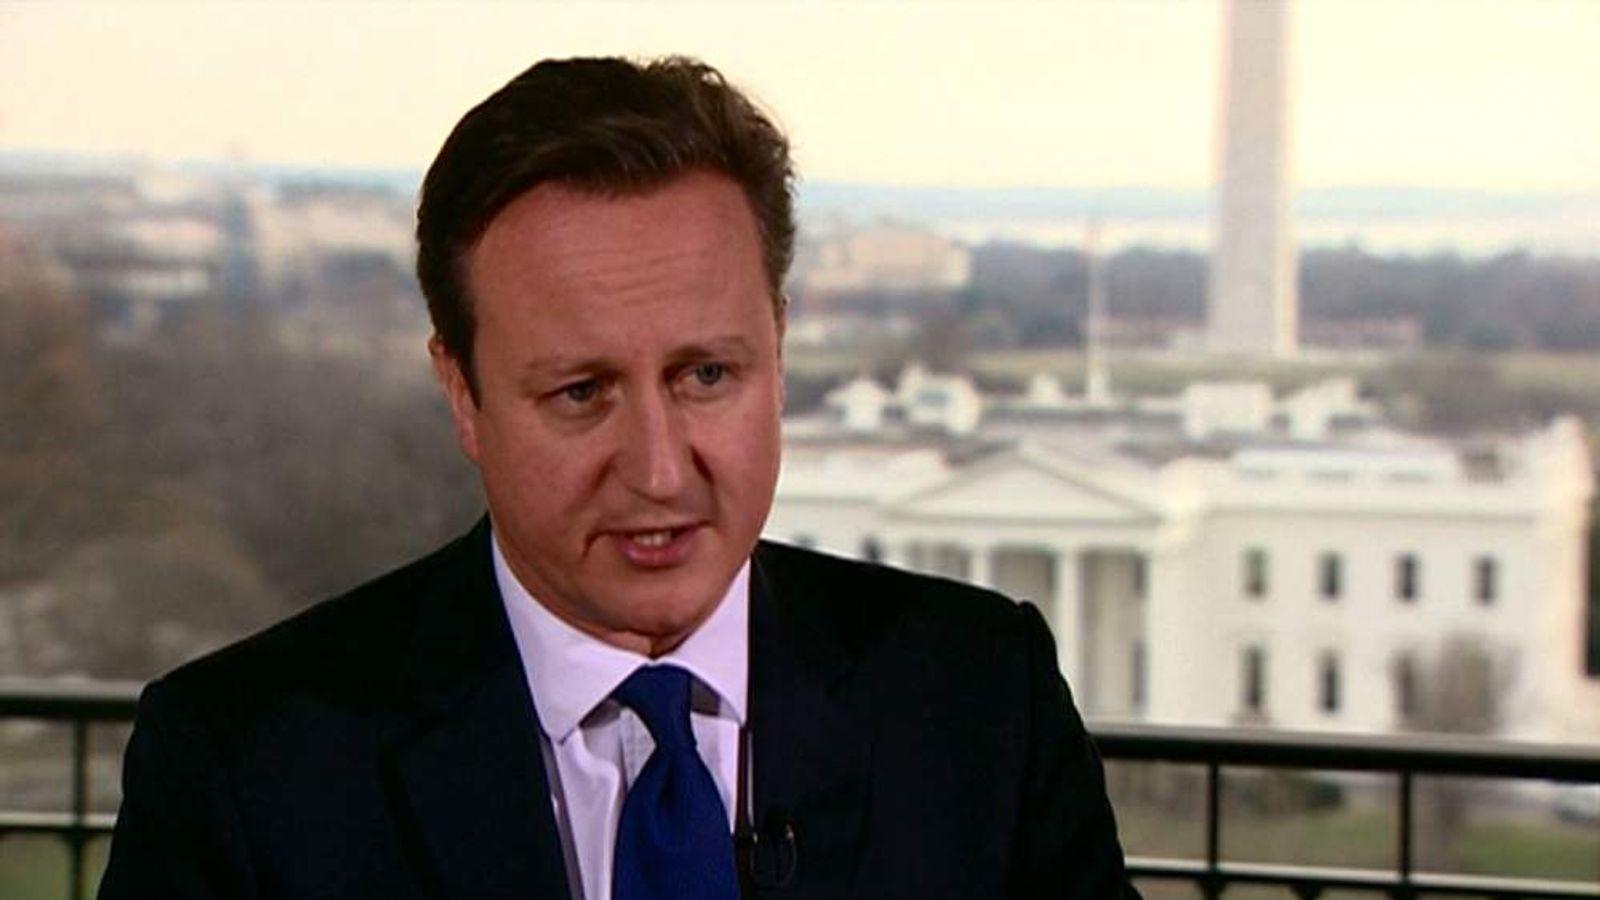 David Cameron in Washington DC January 2015